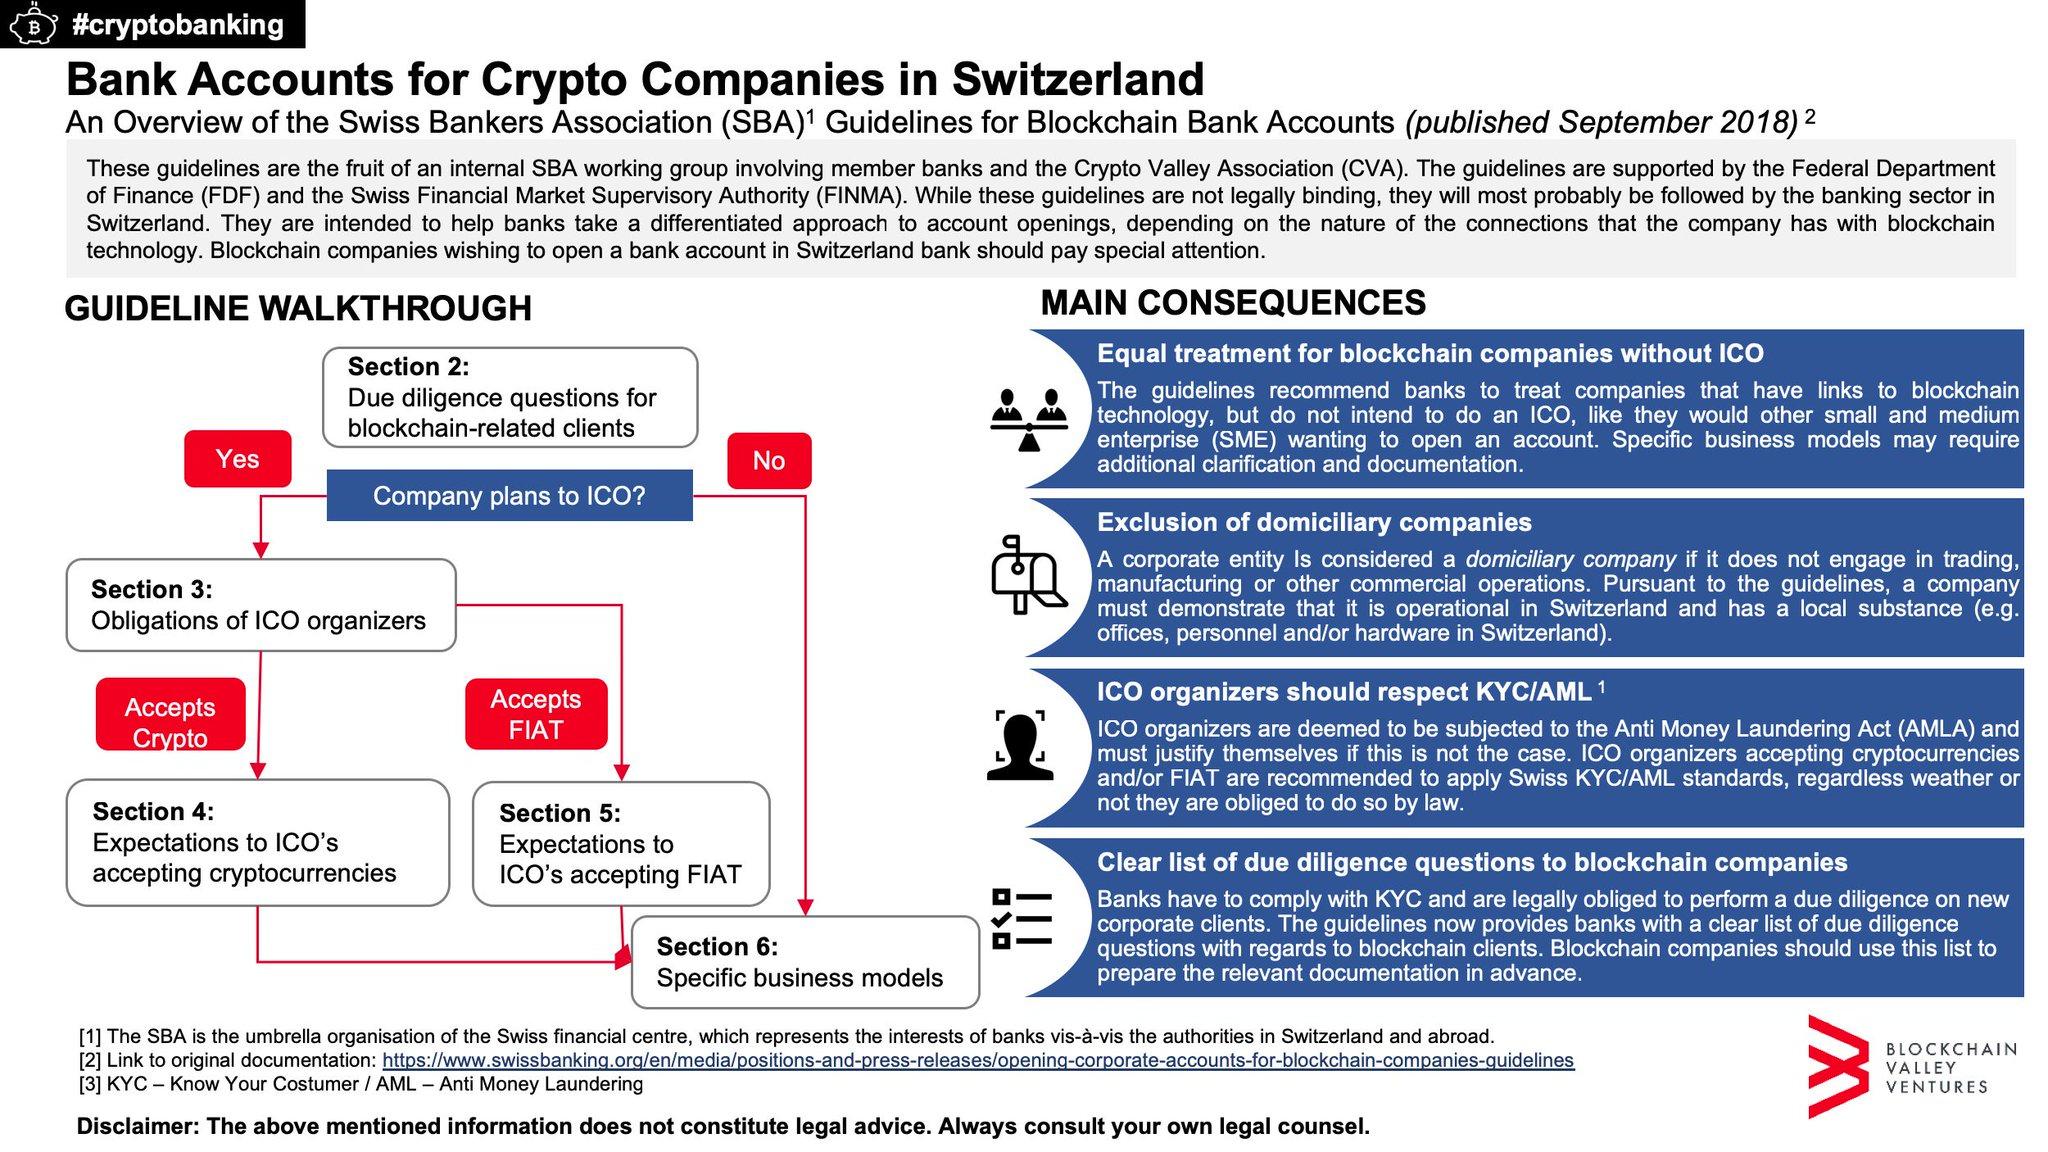 Blockchain Valley Ventures on Twitter: